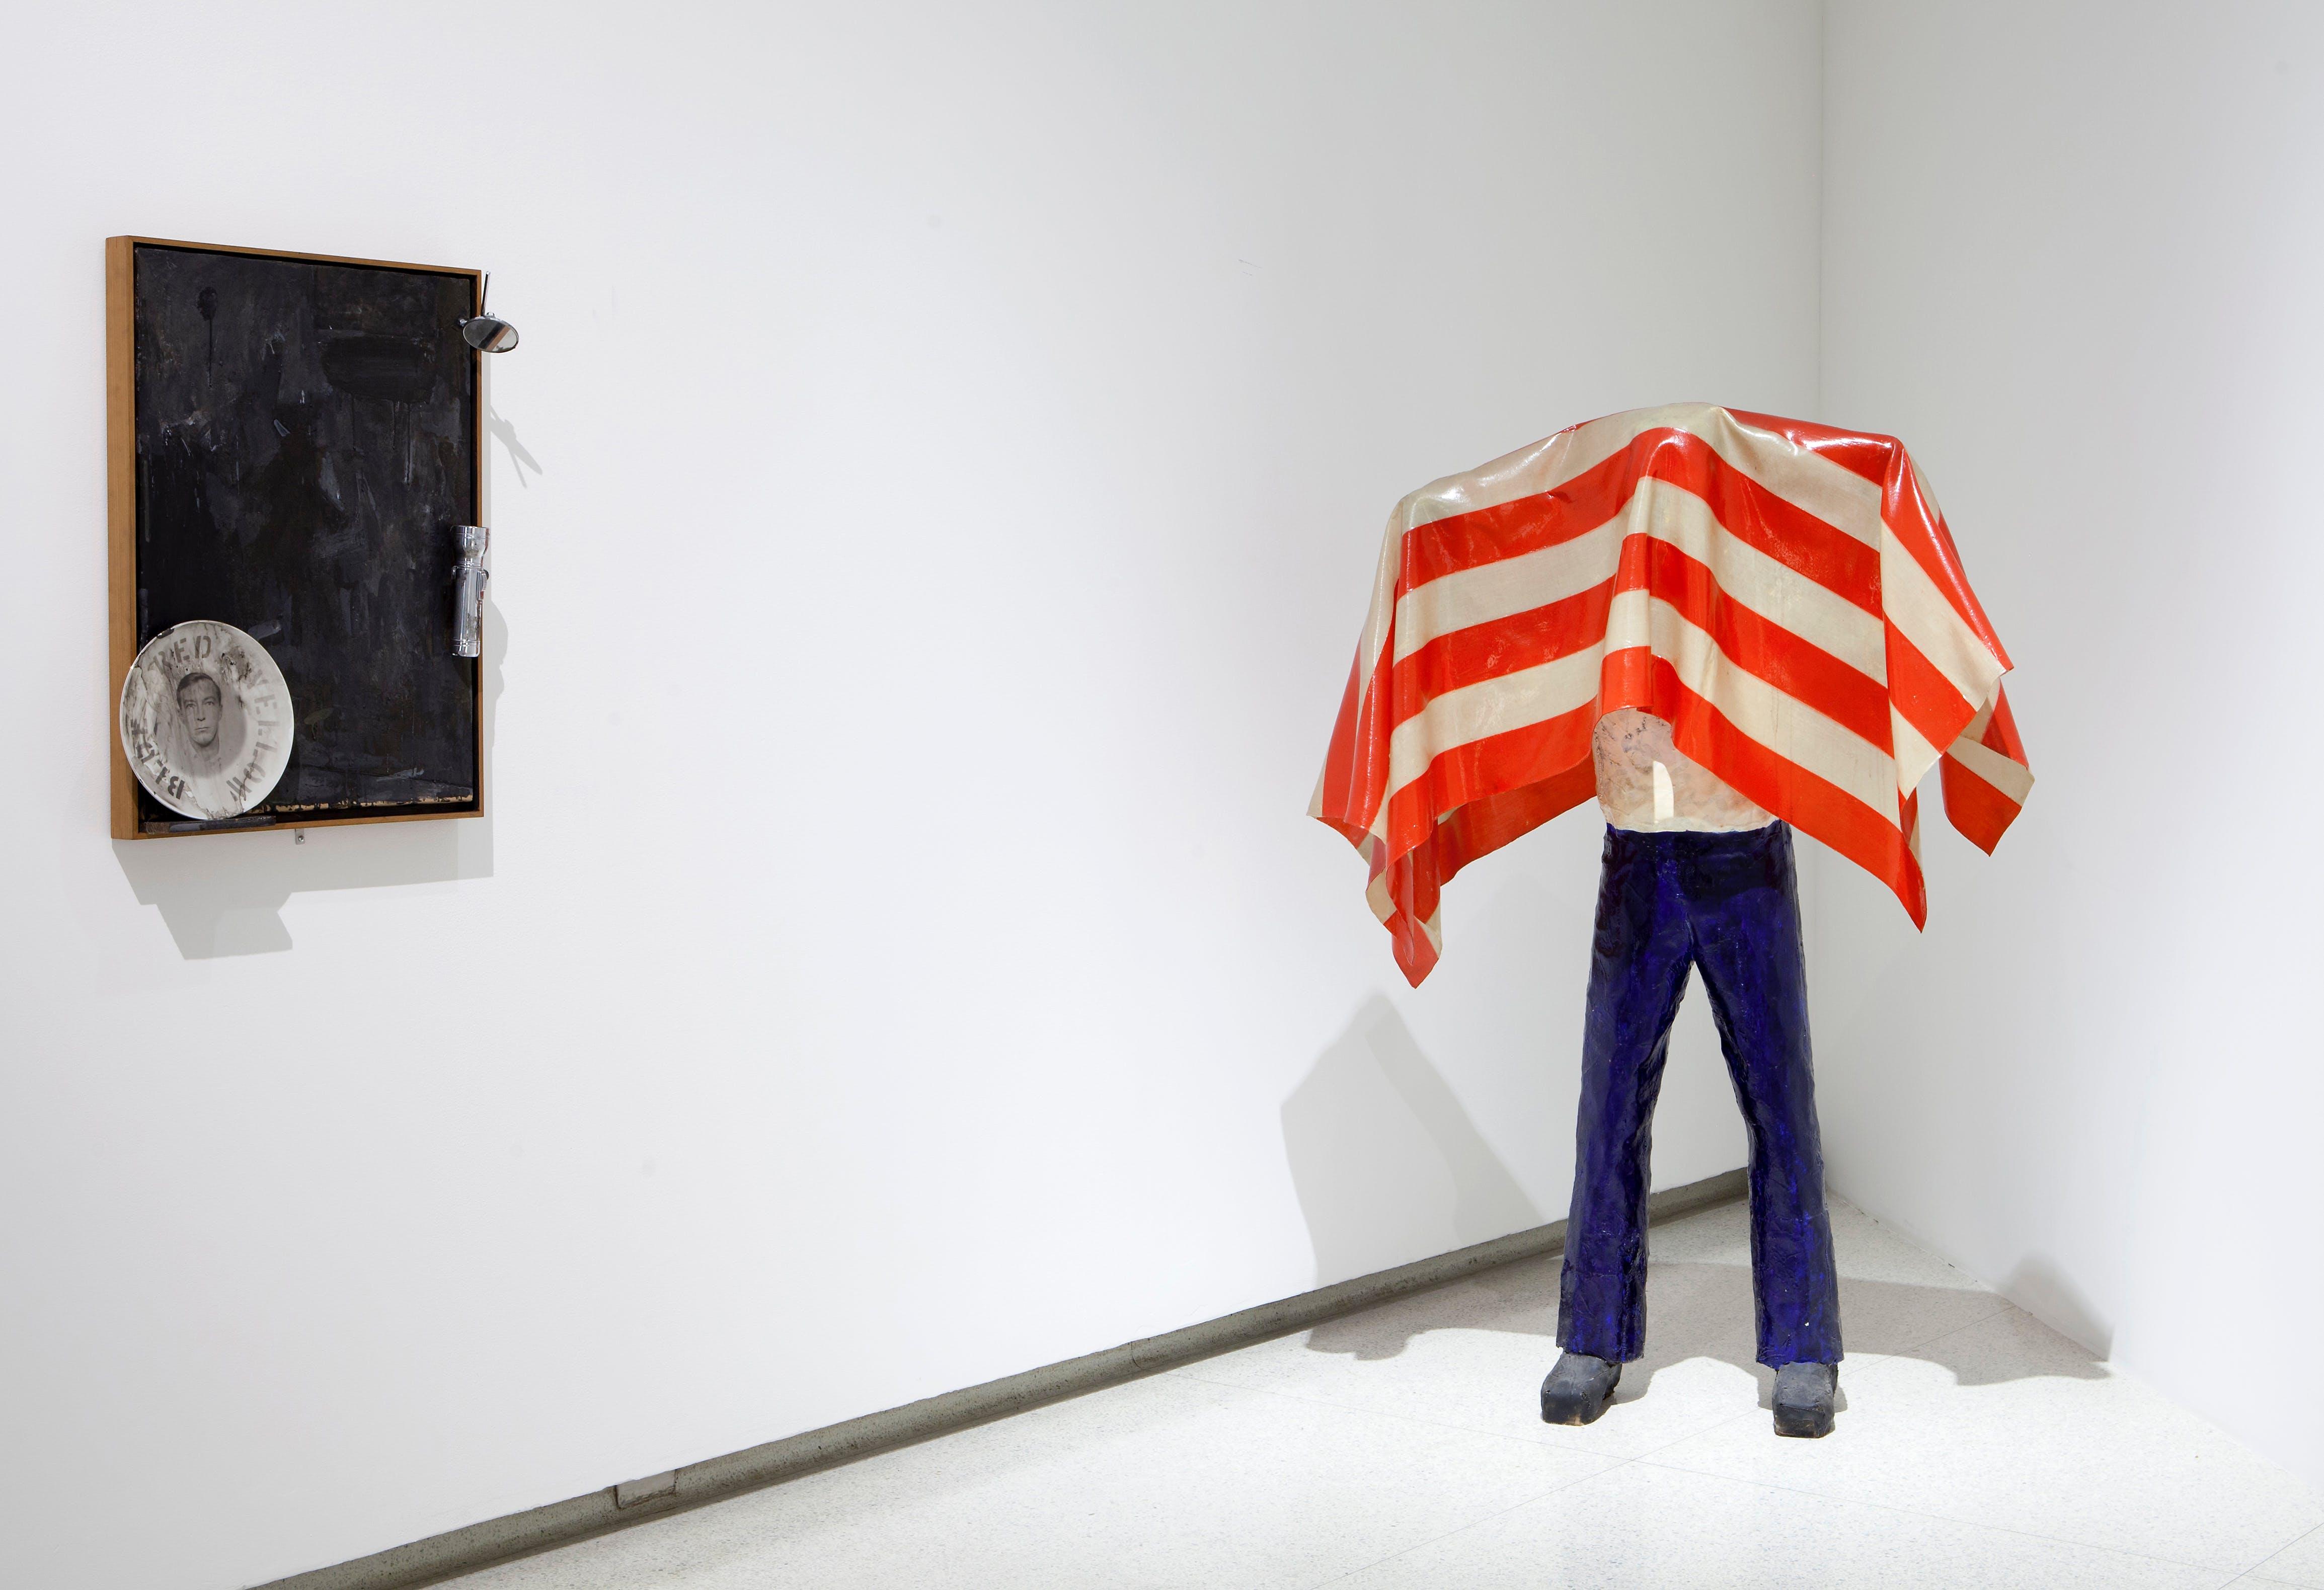 View of the exhibition International Pop, 2015; (left to right): Jasper Johns, Souvenir, 1964; Kojima Nobuaki, Untitled (Figure), 1976